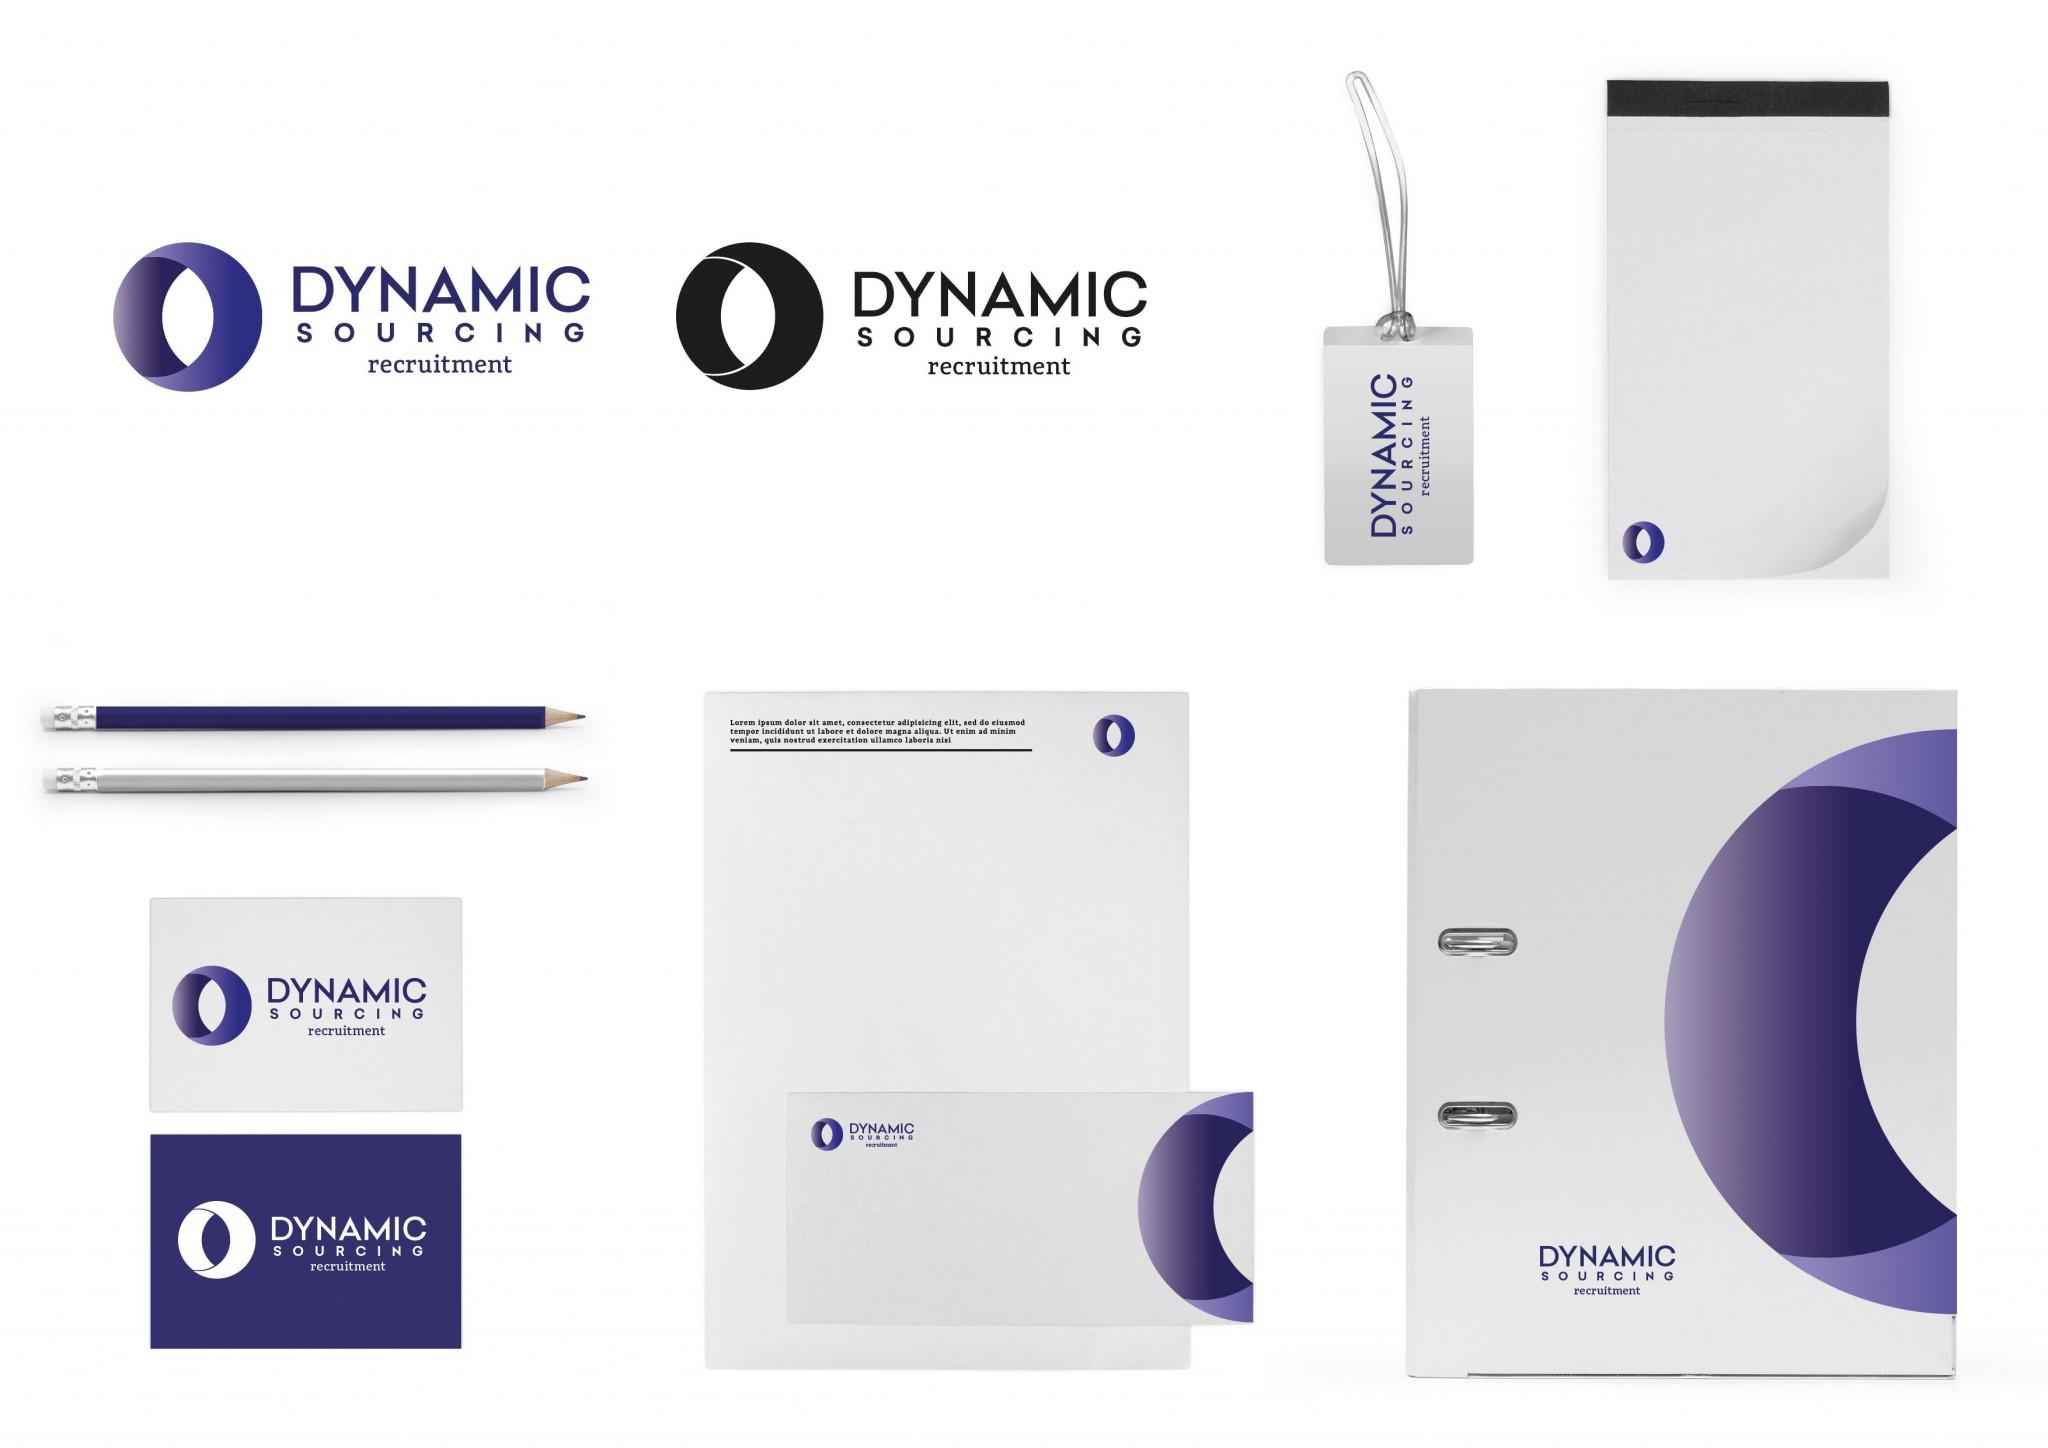 Dynamic Sourcing Brand Design 3